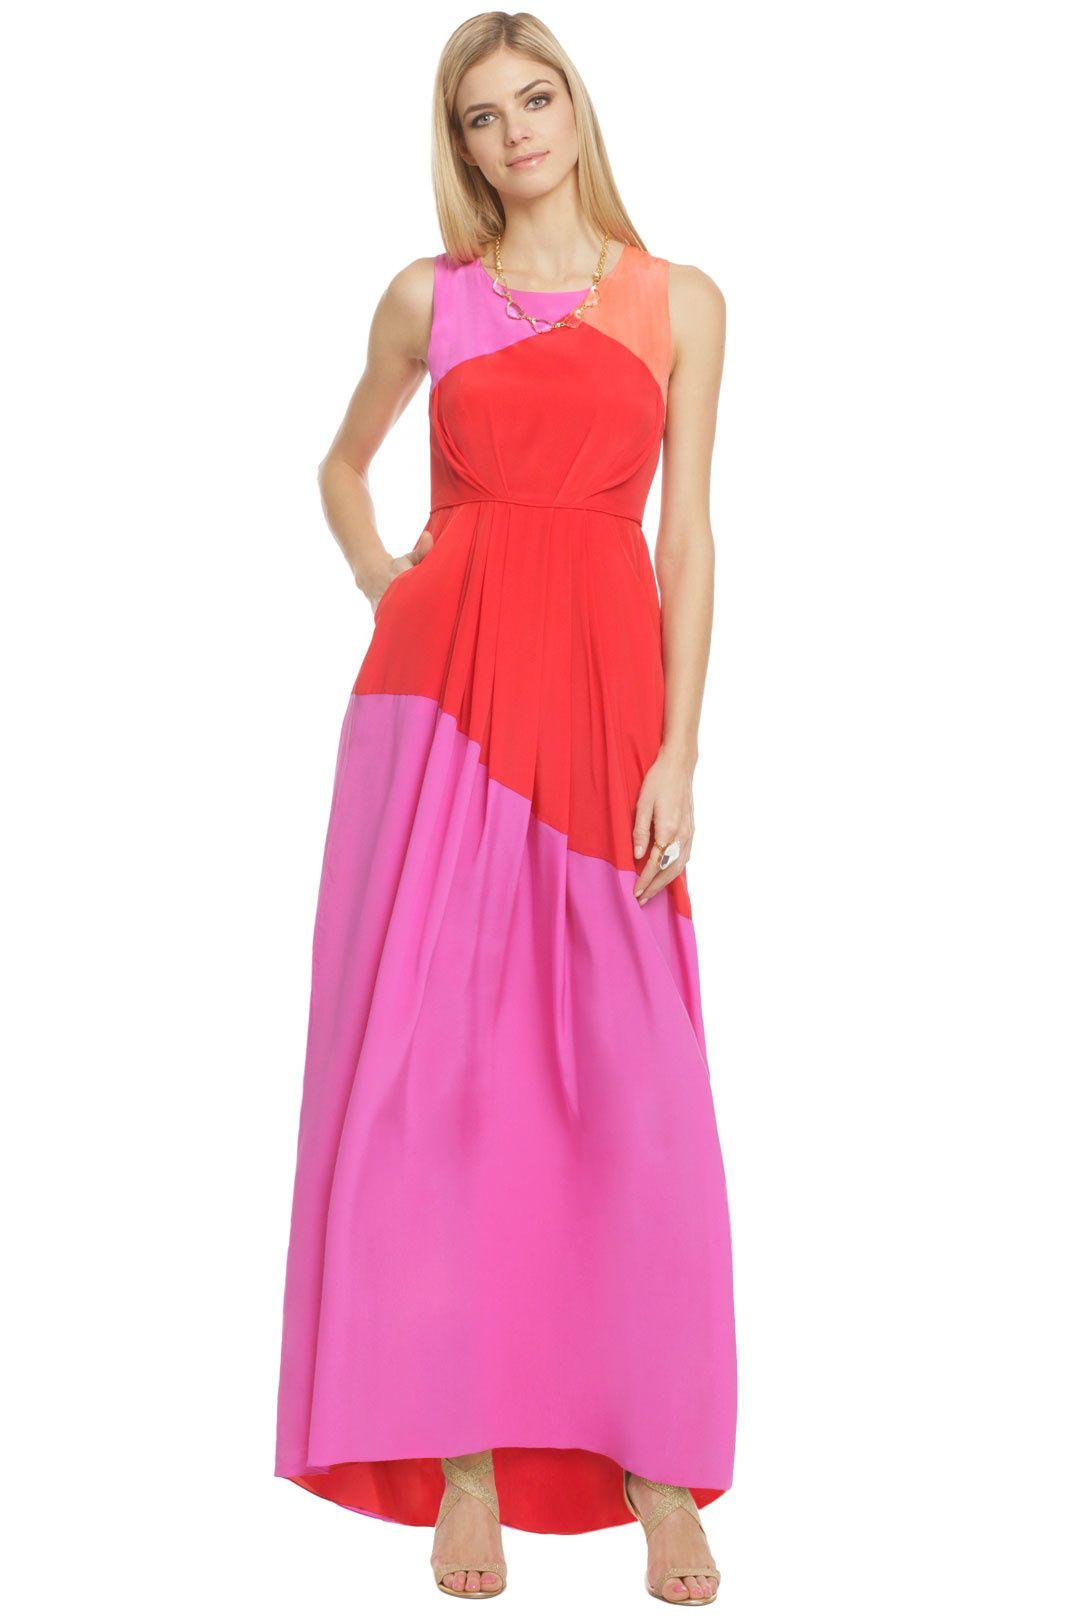 Shoshanna mabrey maxi dress neon love pinterest spring formal